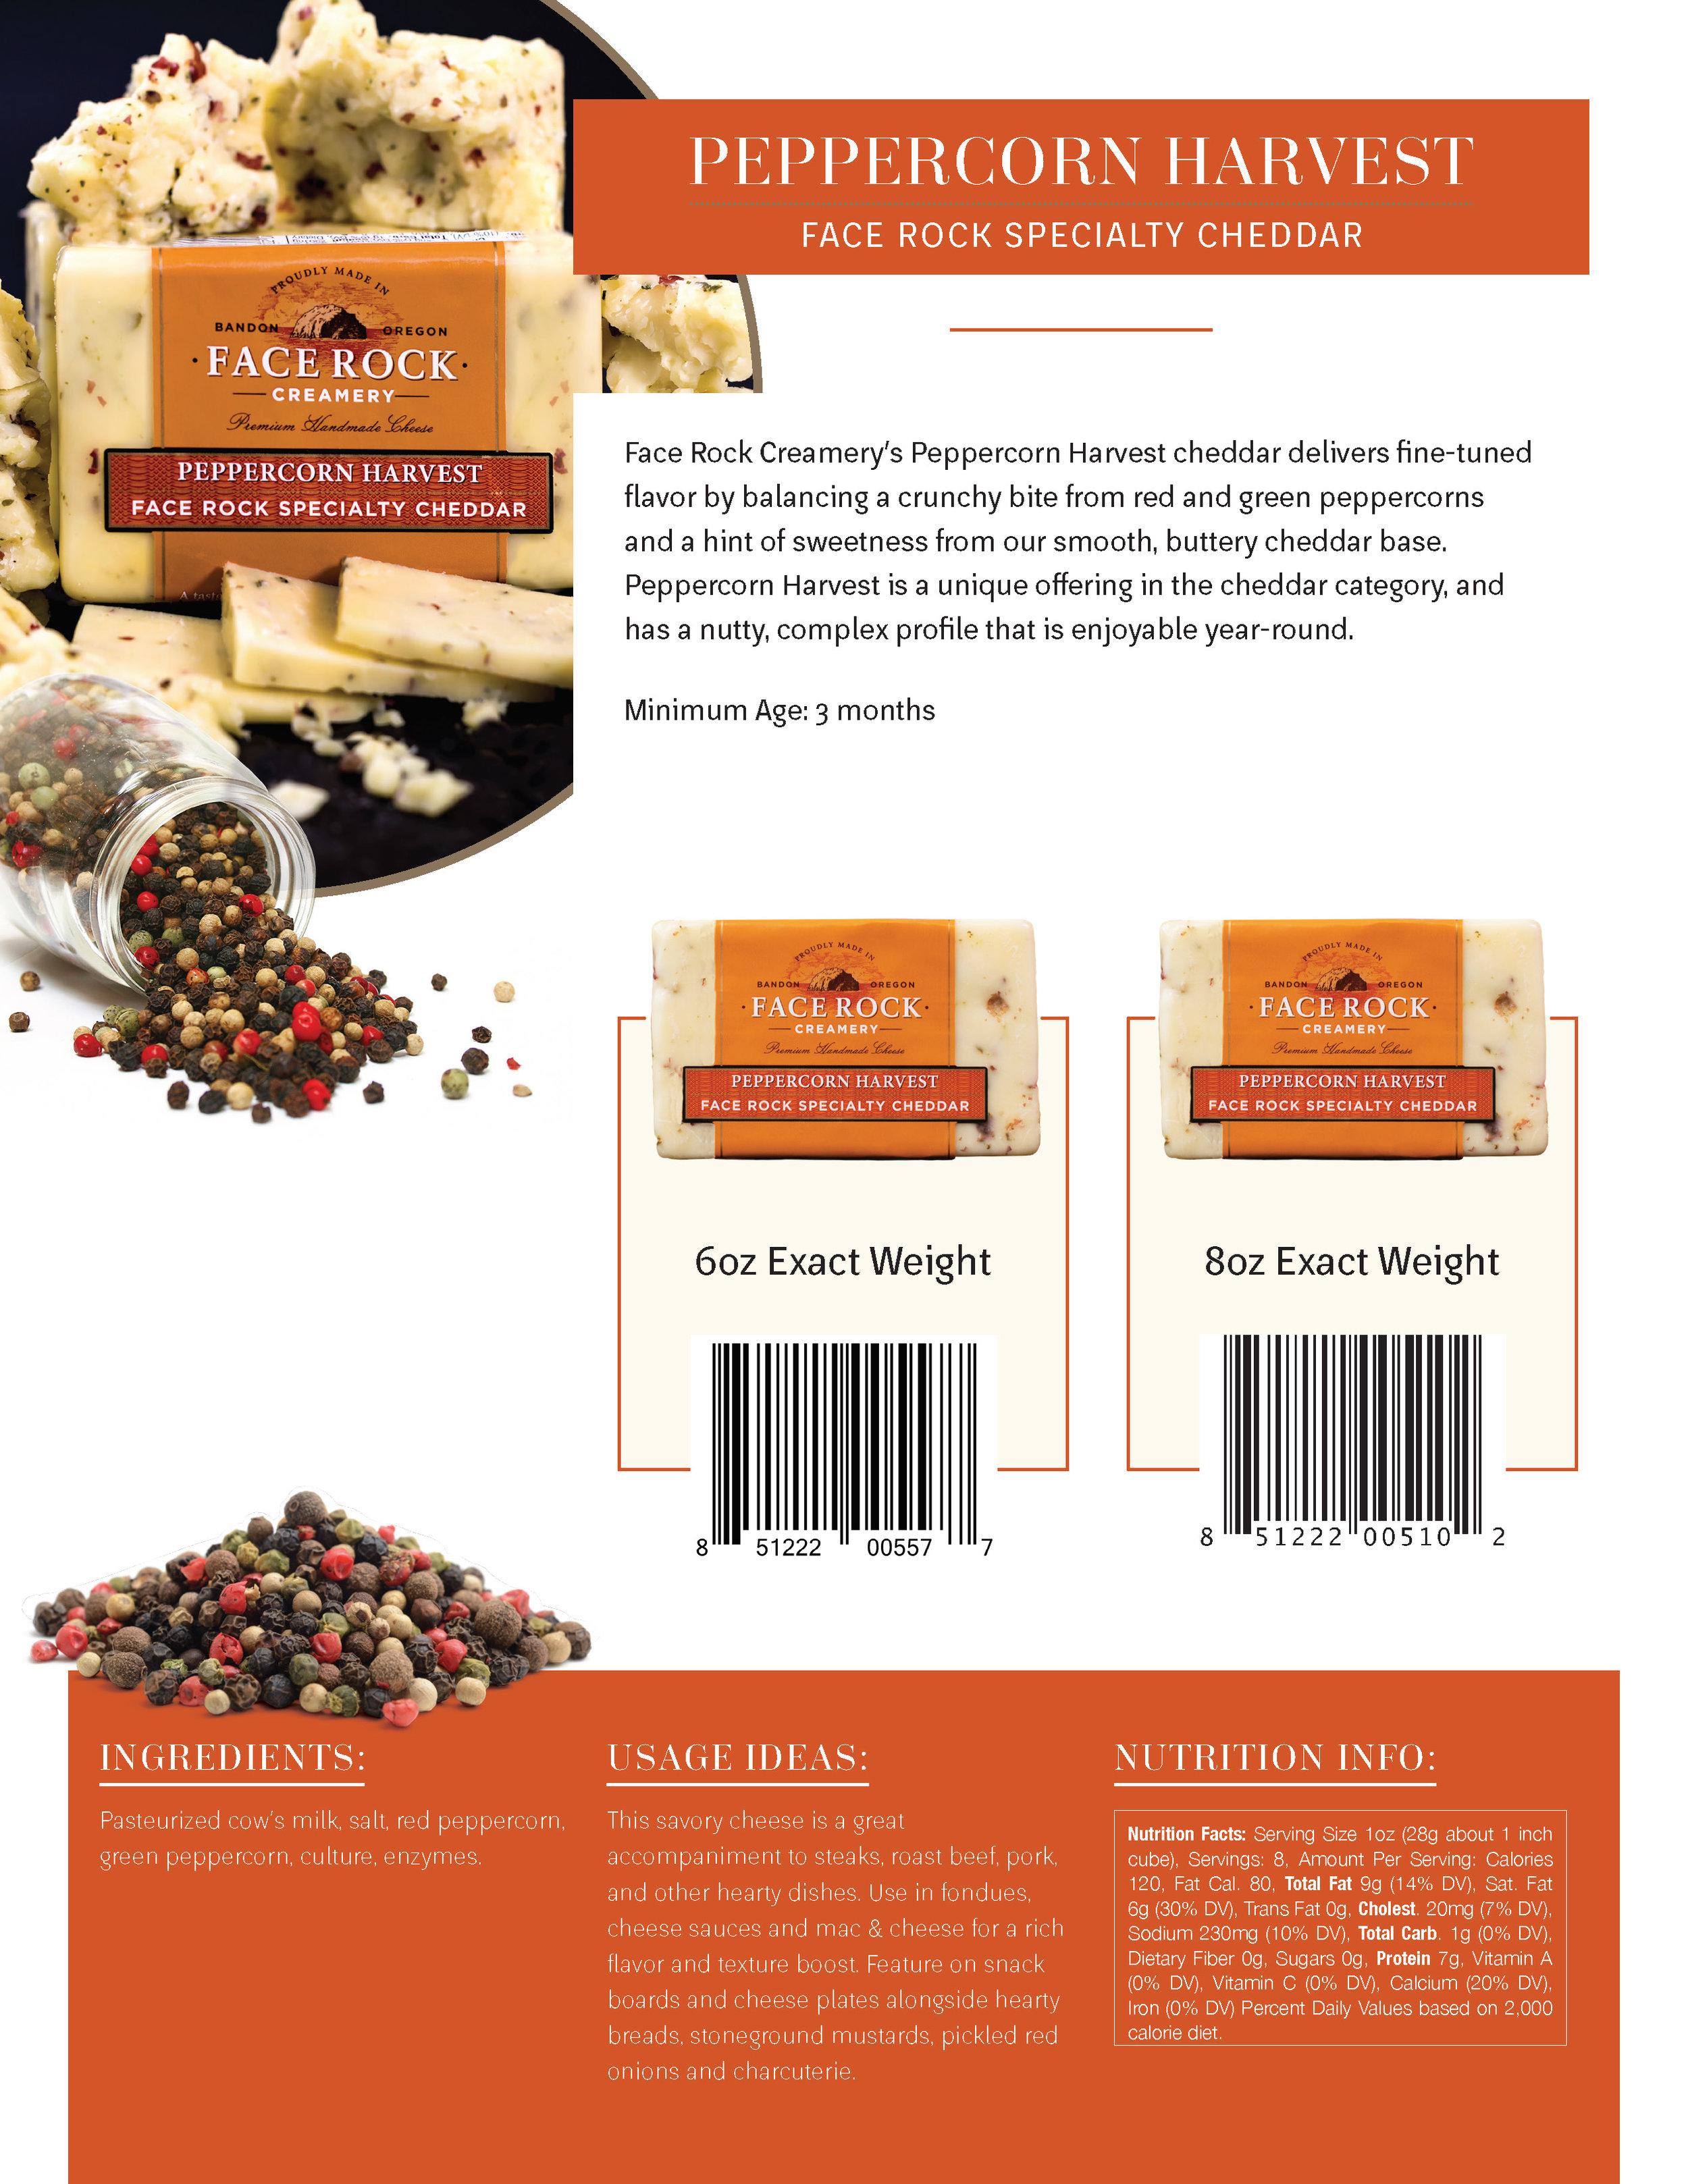 frc-salesheet-2018-peppercorn-harvest-r4-v1_Page_1.jpg